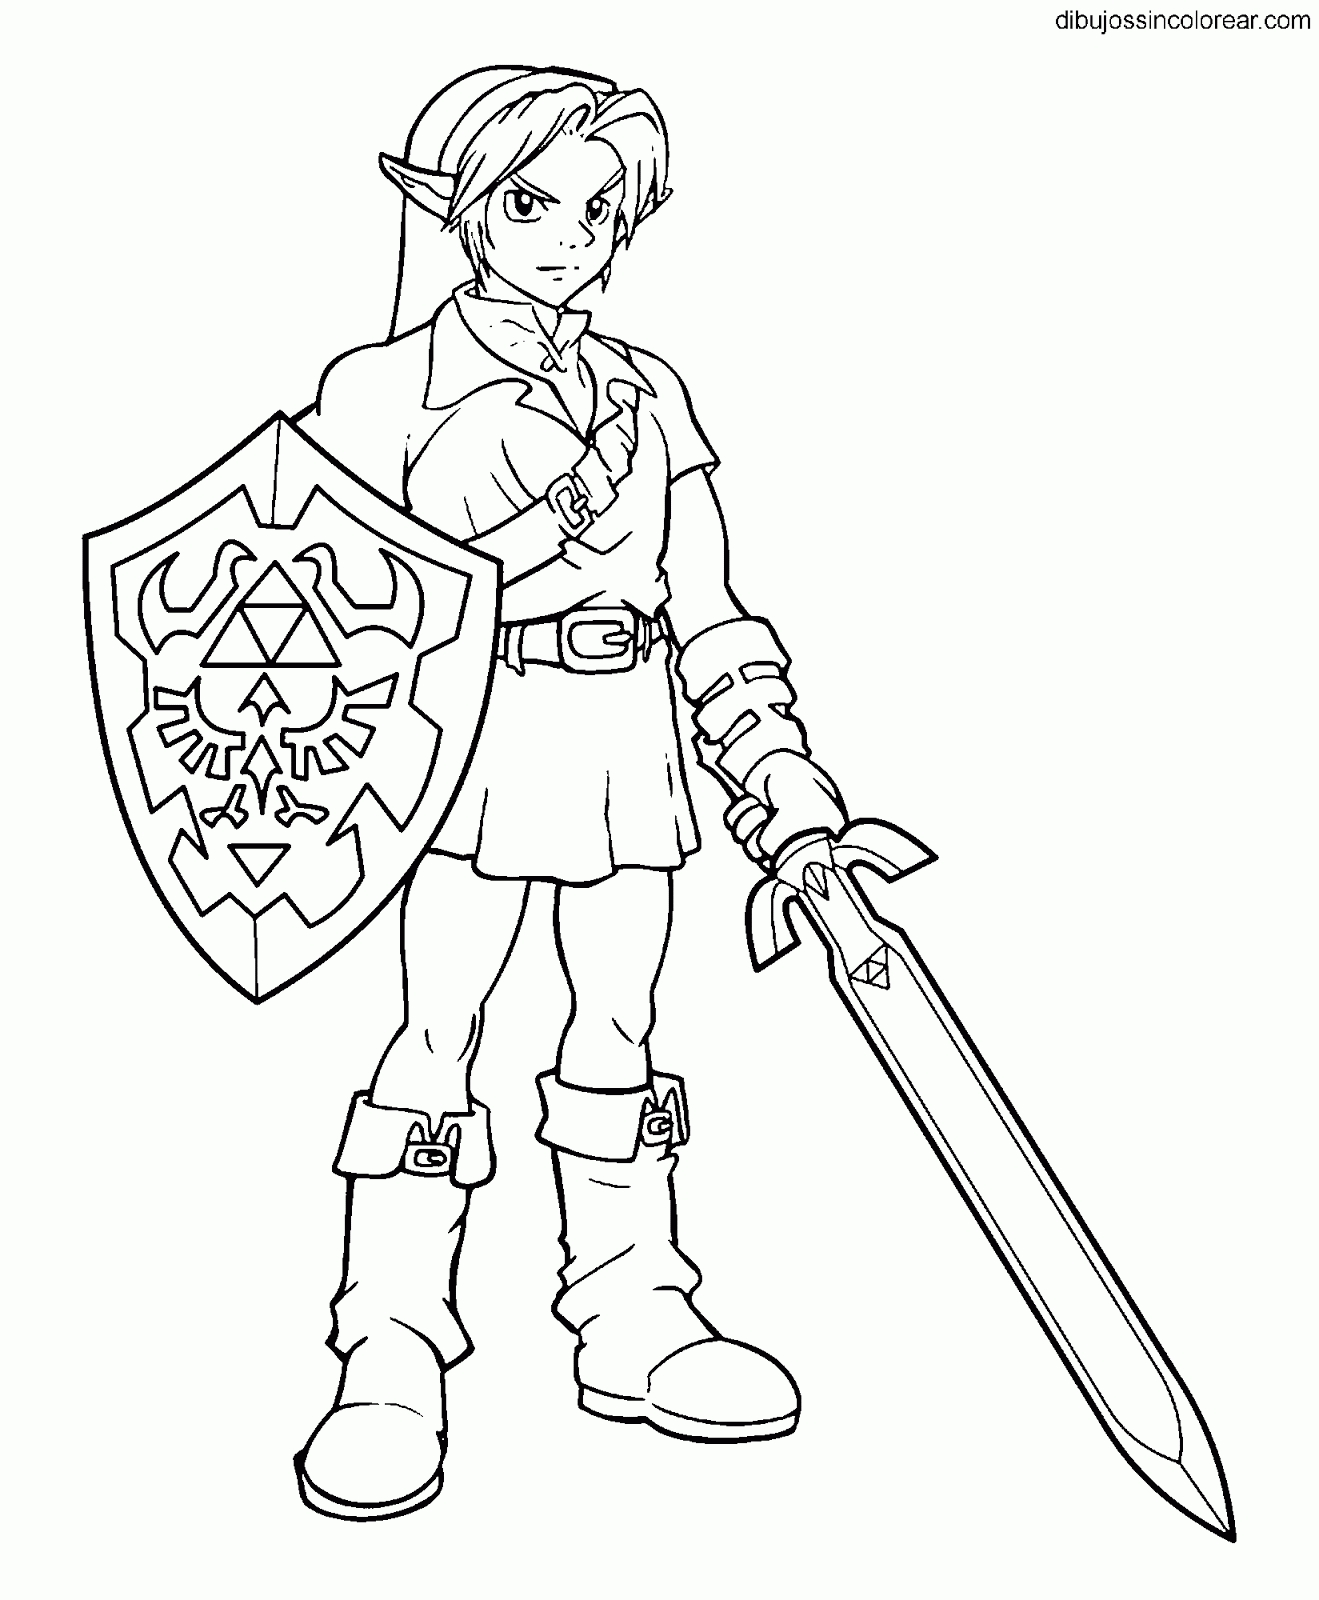 Super Smash Bros Drawing at GetDrawings | Free download